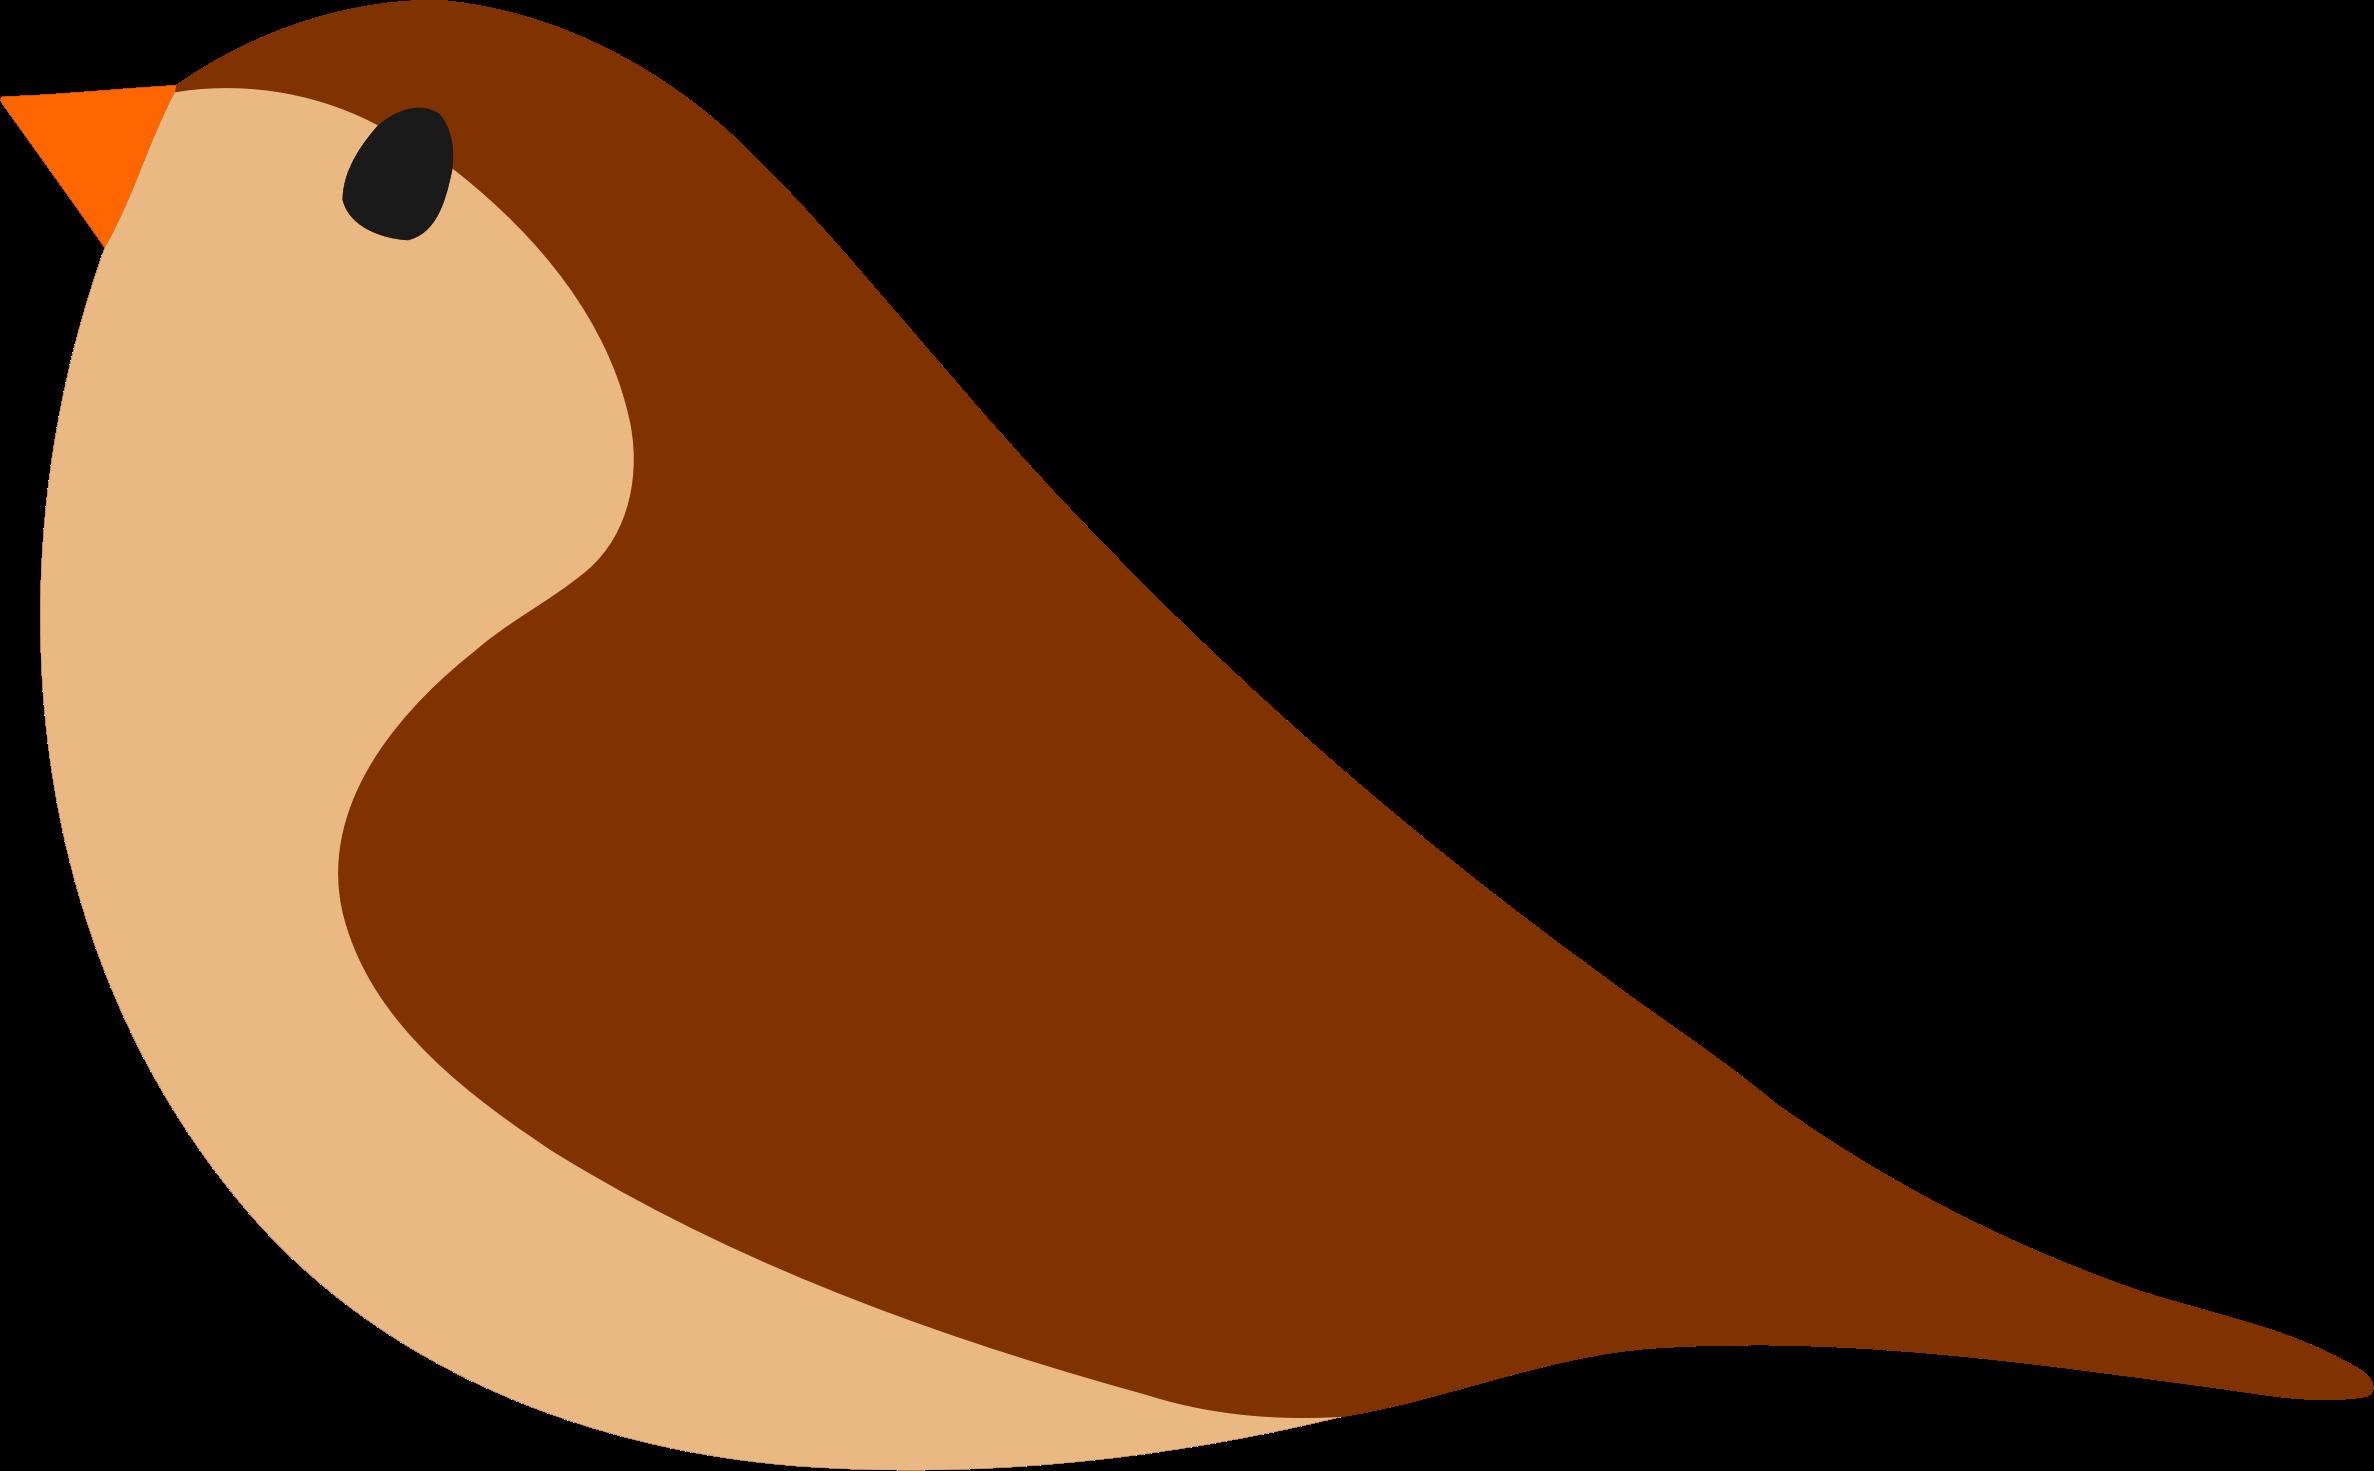 Bird clipart simple. Big image png